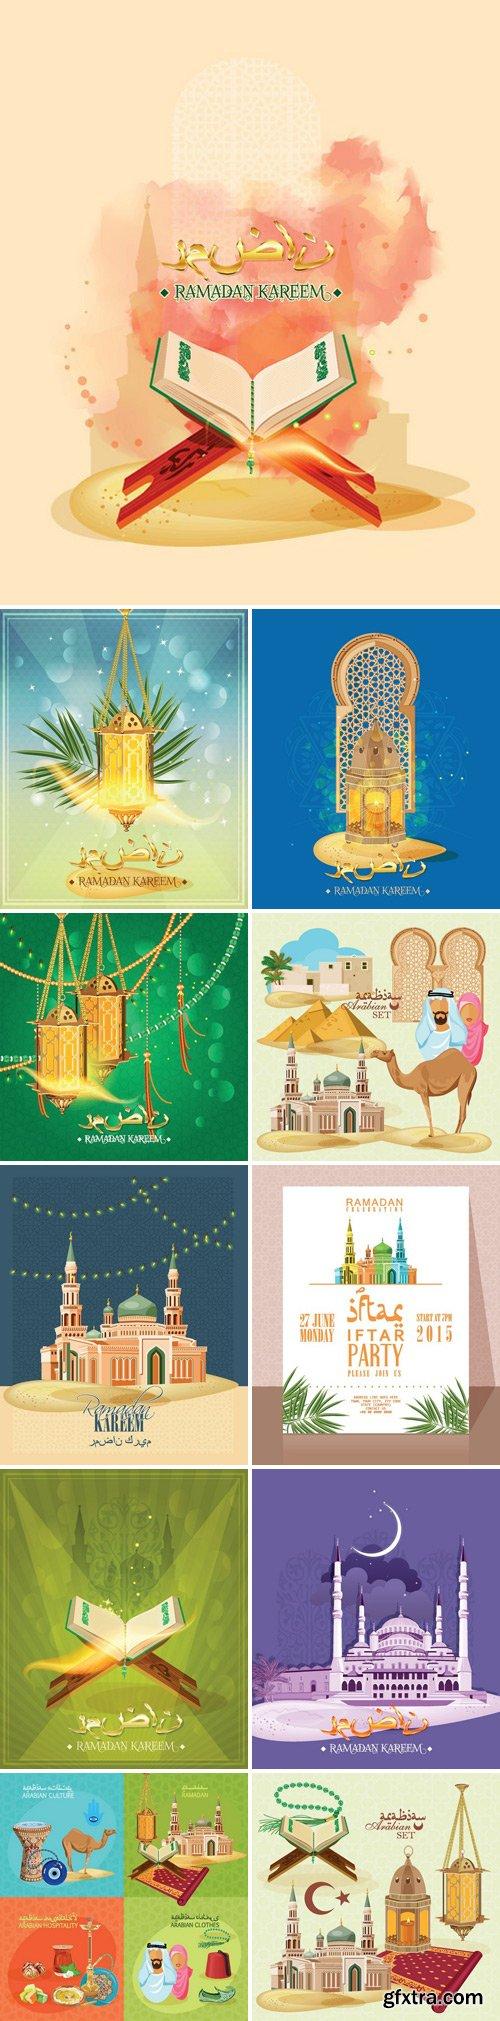 Stock Vectors - Ramadan Kareem Celebration 2